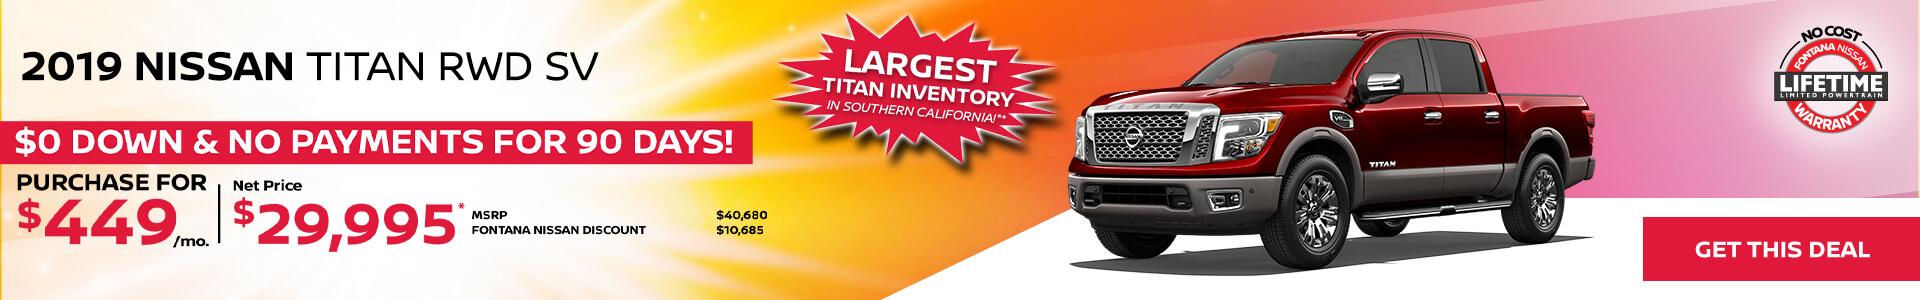 Nissan Titan $449